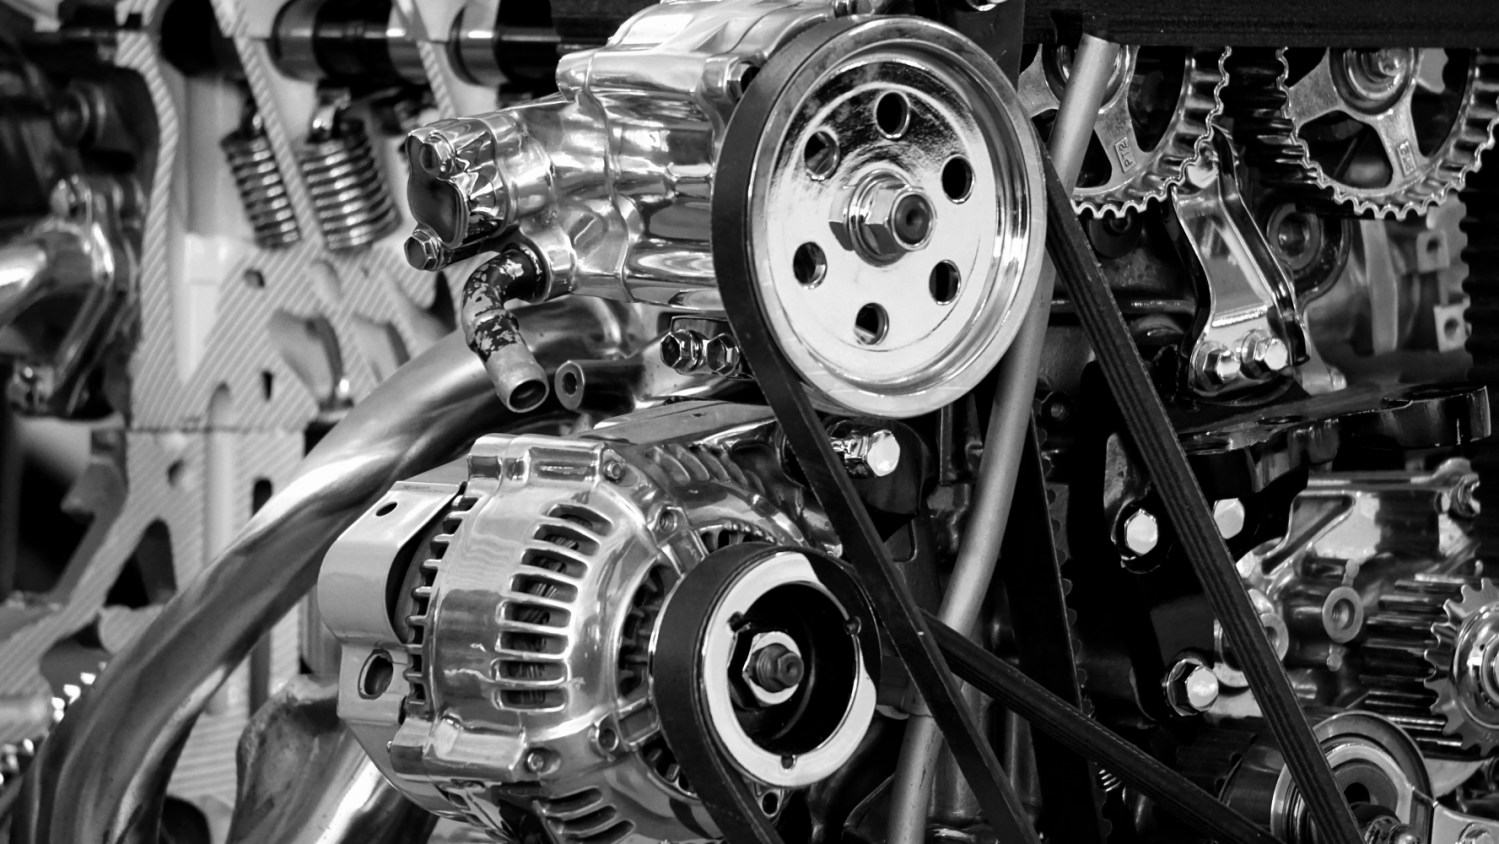 Free stock photos of motor · Pexels